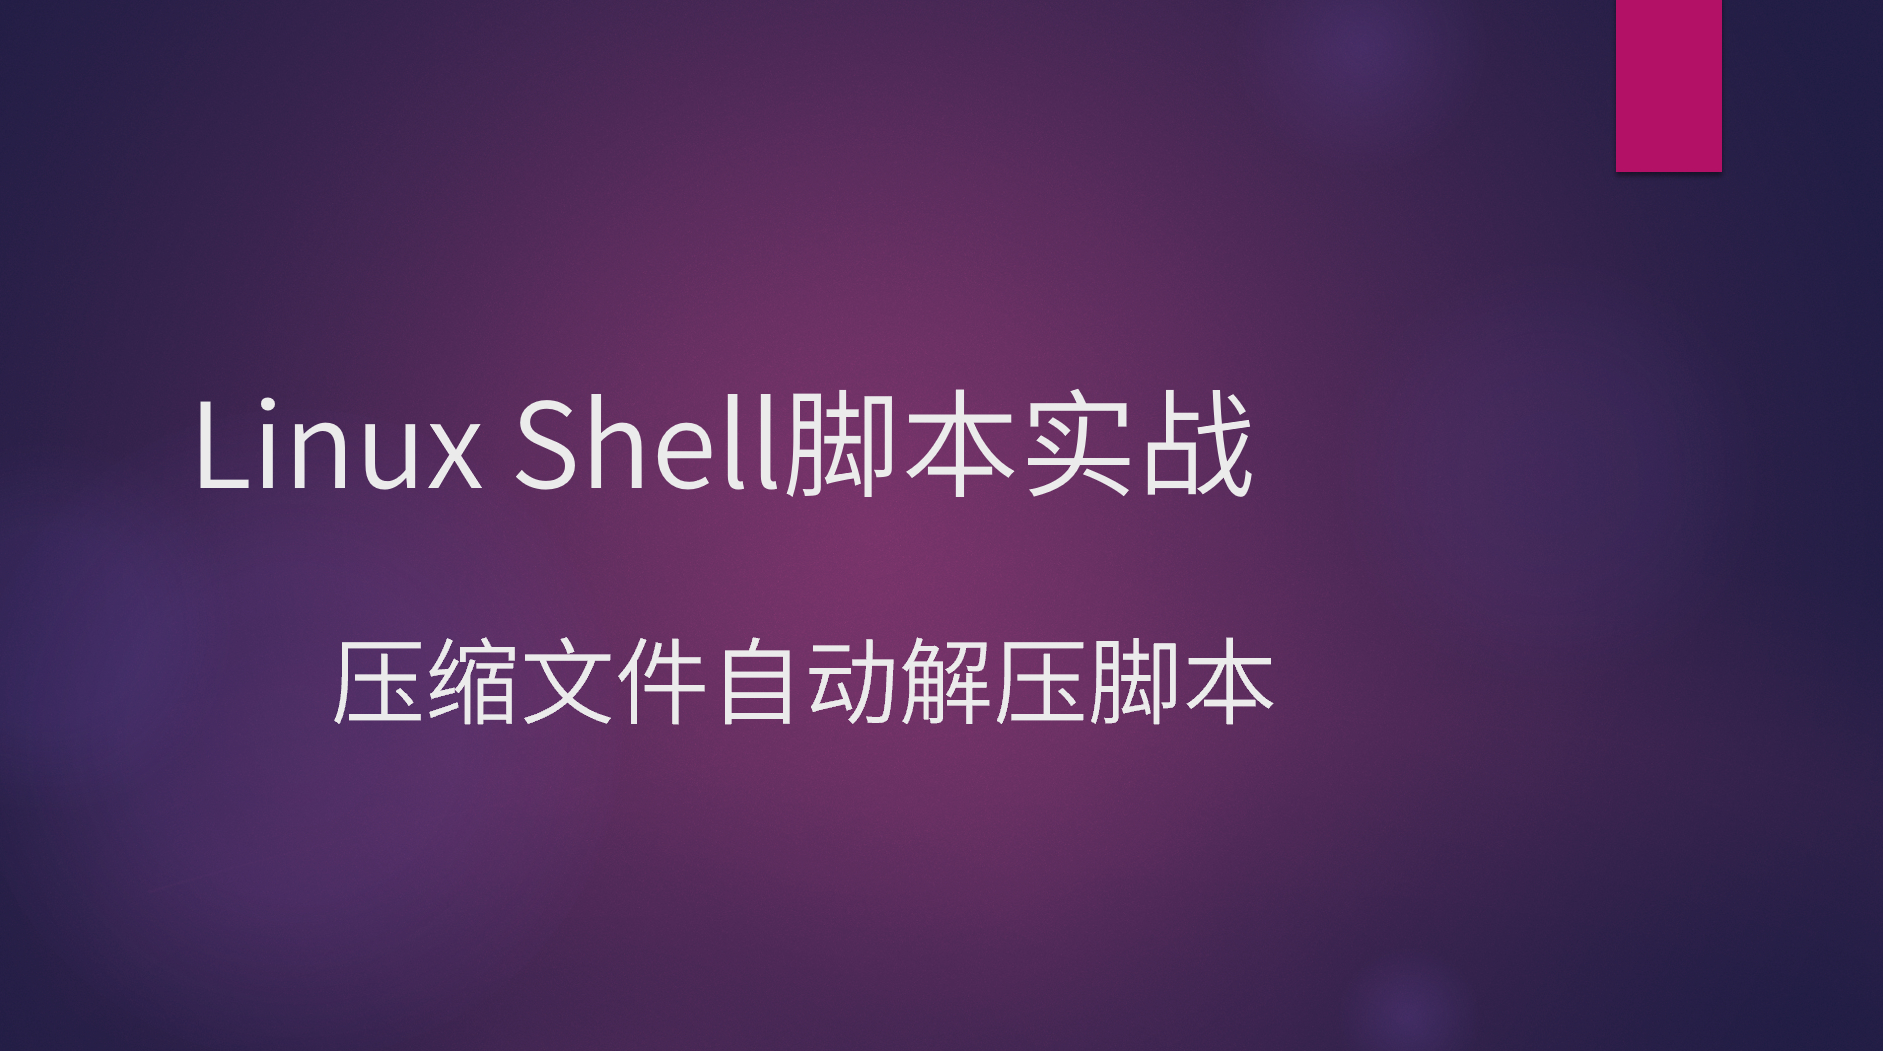 Linux Shell脚本实战-压缩文件自动解压脚本